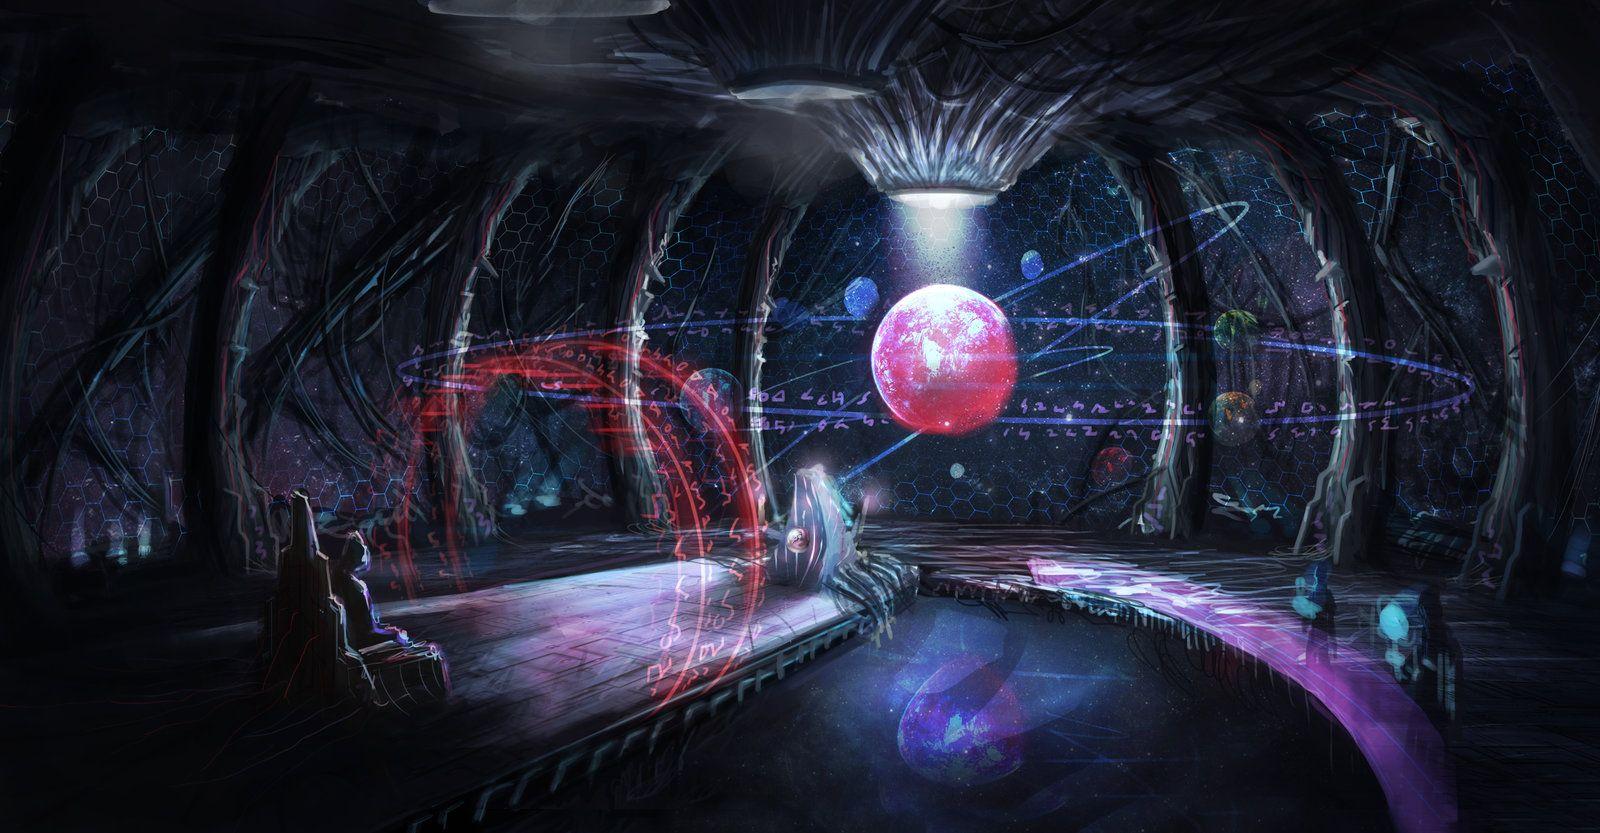 alien spaceship cockpit interior nicholas koo on artstation at. Black Bedroom Furniture Sets. Home Design Ideas